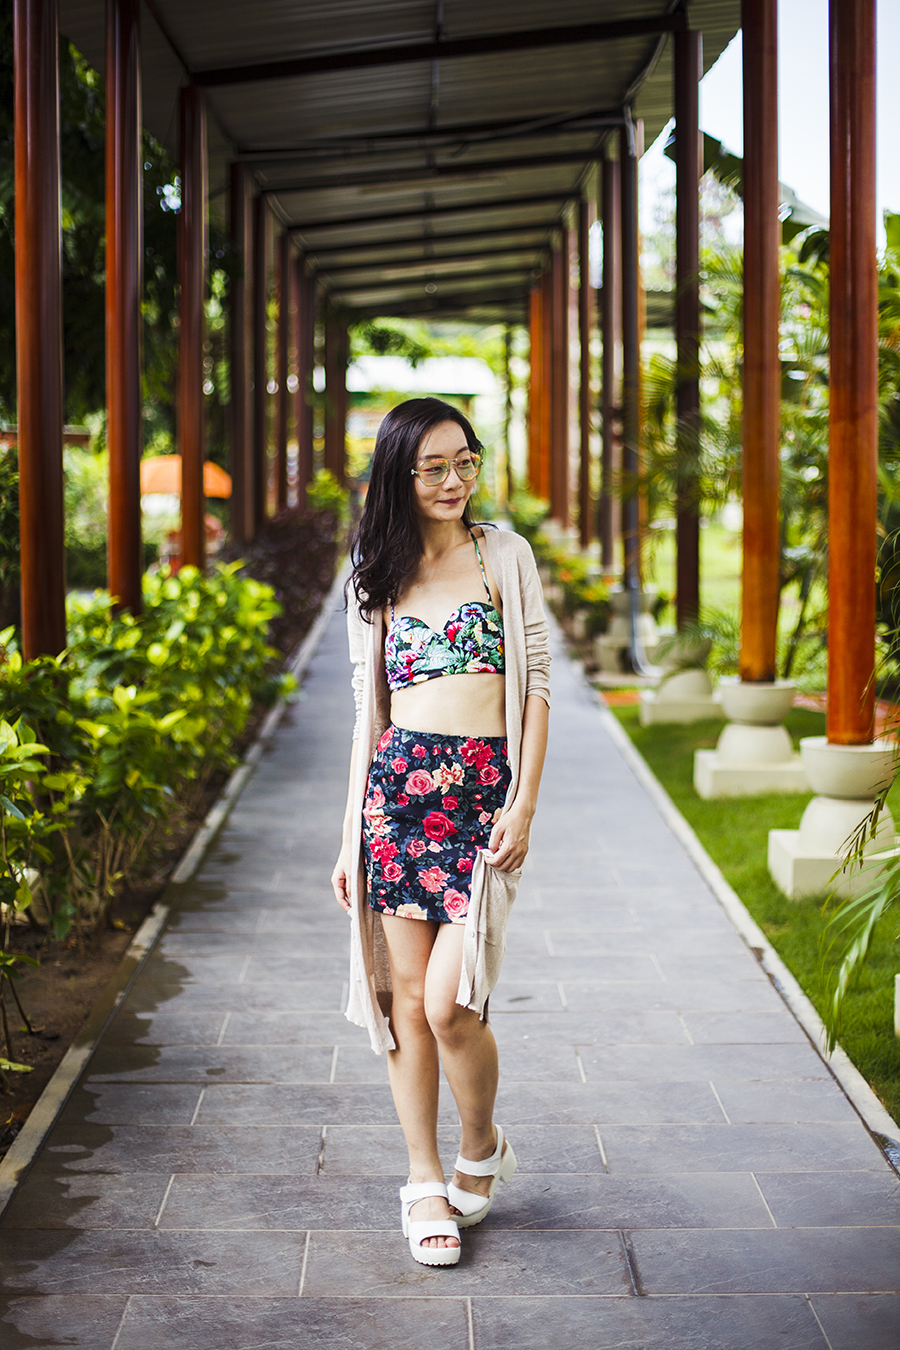 Floral two piece poolside outfit:  Motel Rocks floral bikini top, Forever 21 floral banded skirt, Guess iridescent sunglasses, Taobao white platform sandals, Zara long v-neck cardigan, Osewaya mermaid earrings via JRunway.